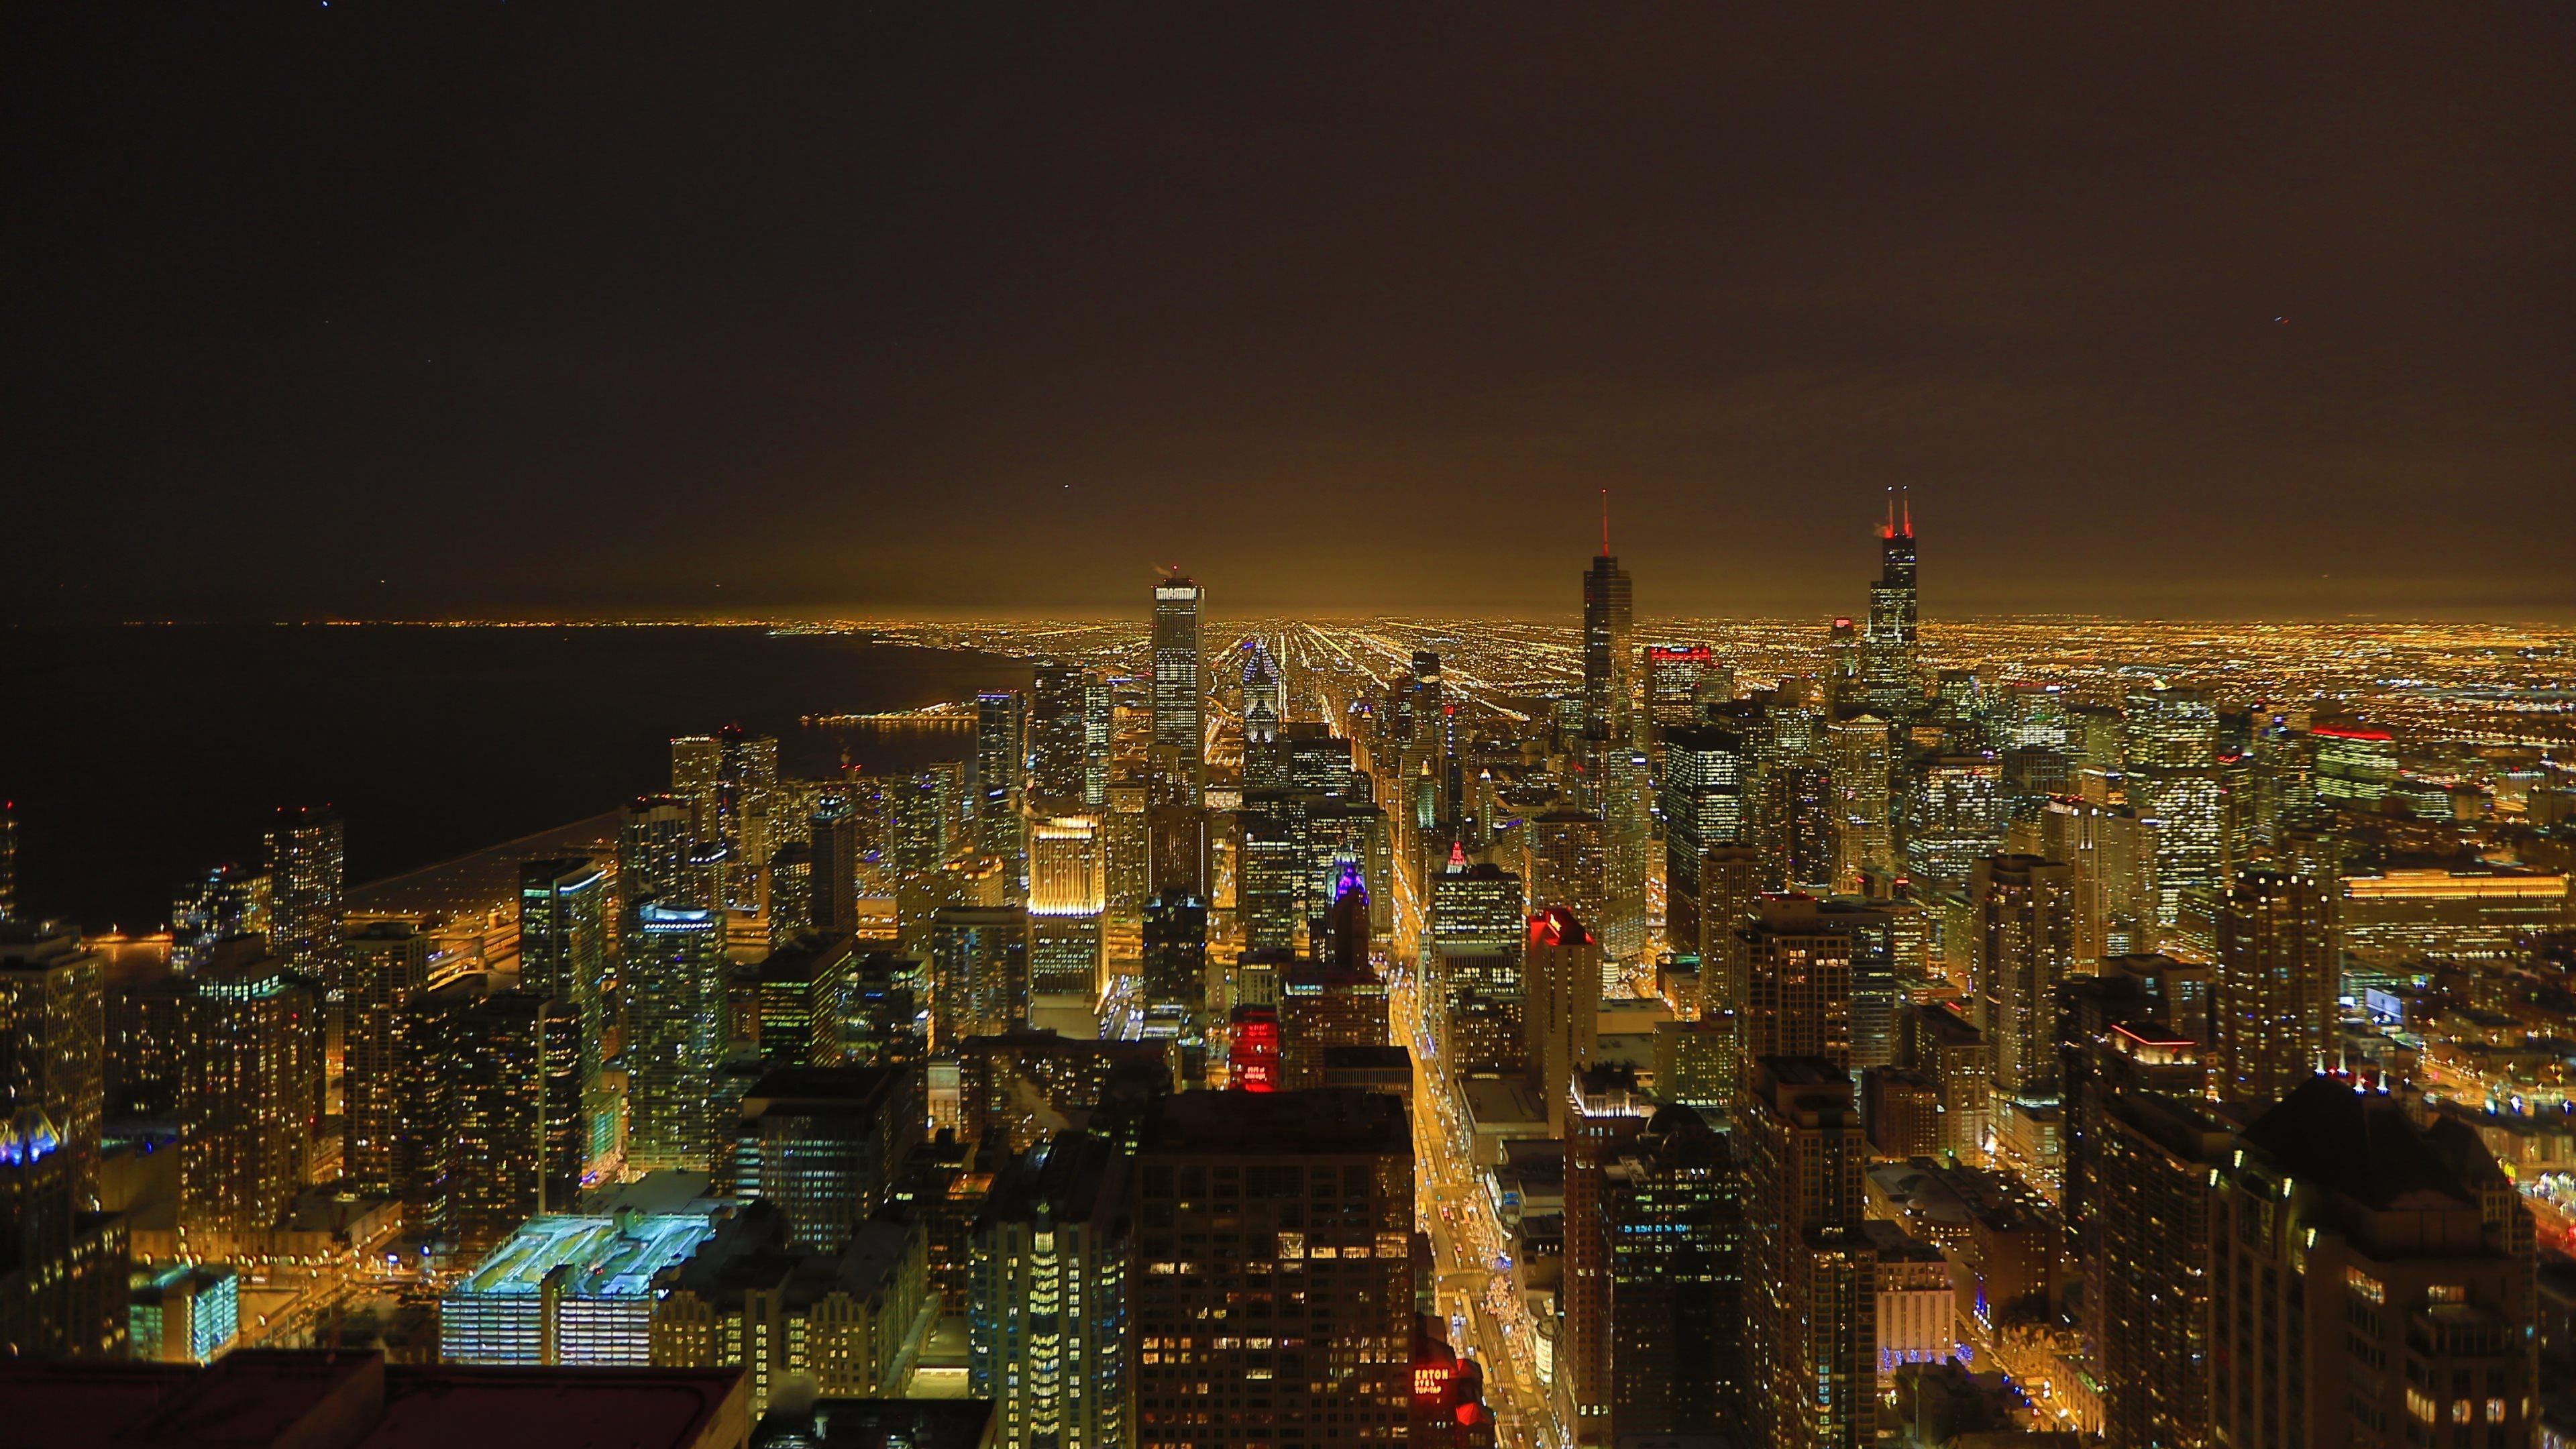 Chicago 4k wallpaper wallpapersafari - Background images 4k hd ...